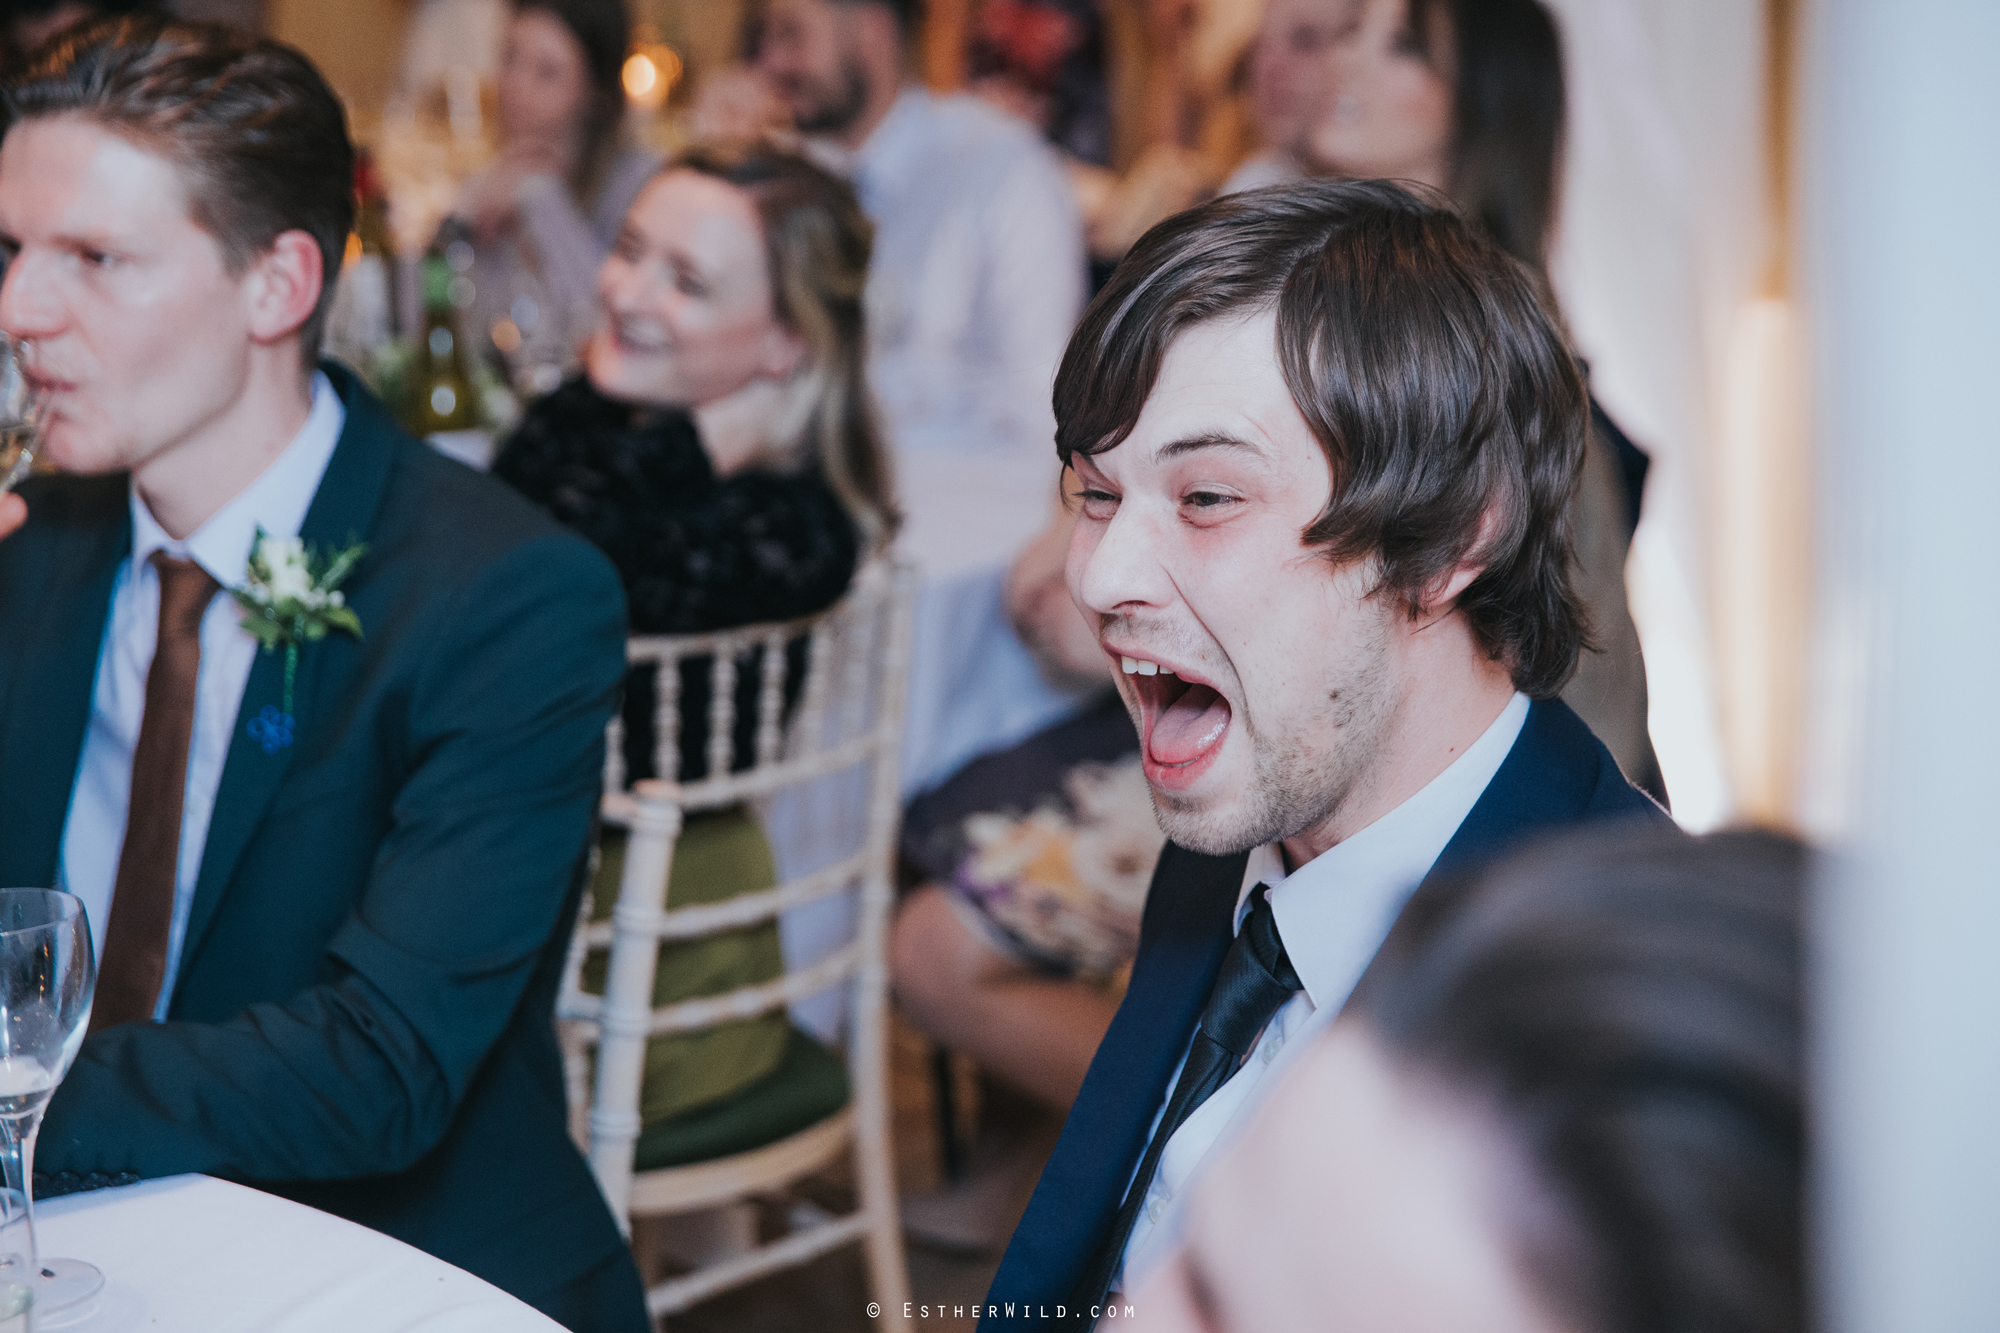 Elms_Barn_Weddings_Suffolk_Photographer_Copyright_Esther_Wild_IMG_2615.jpg